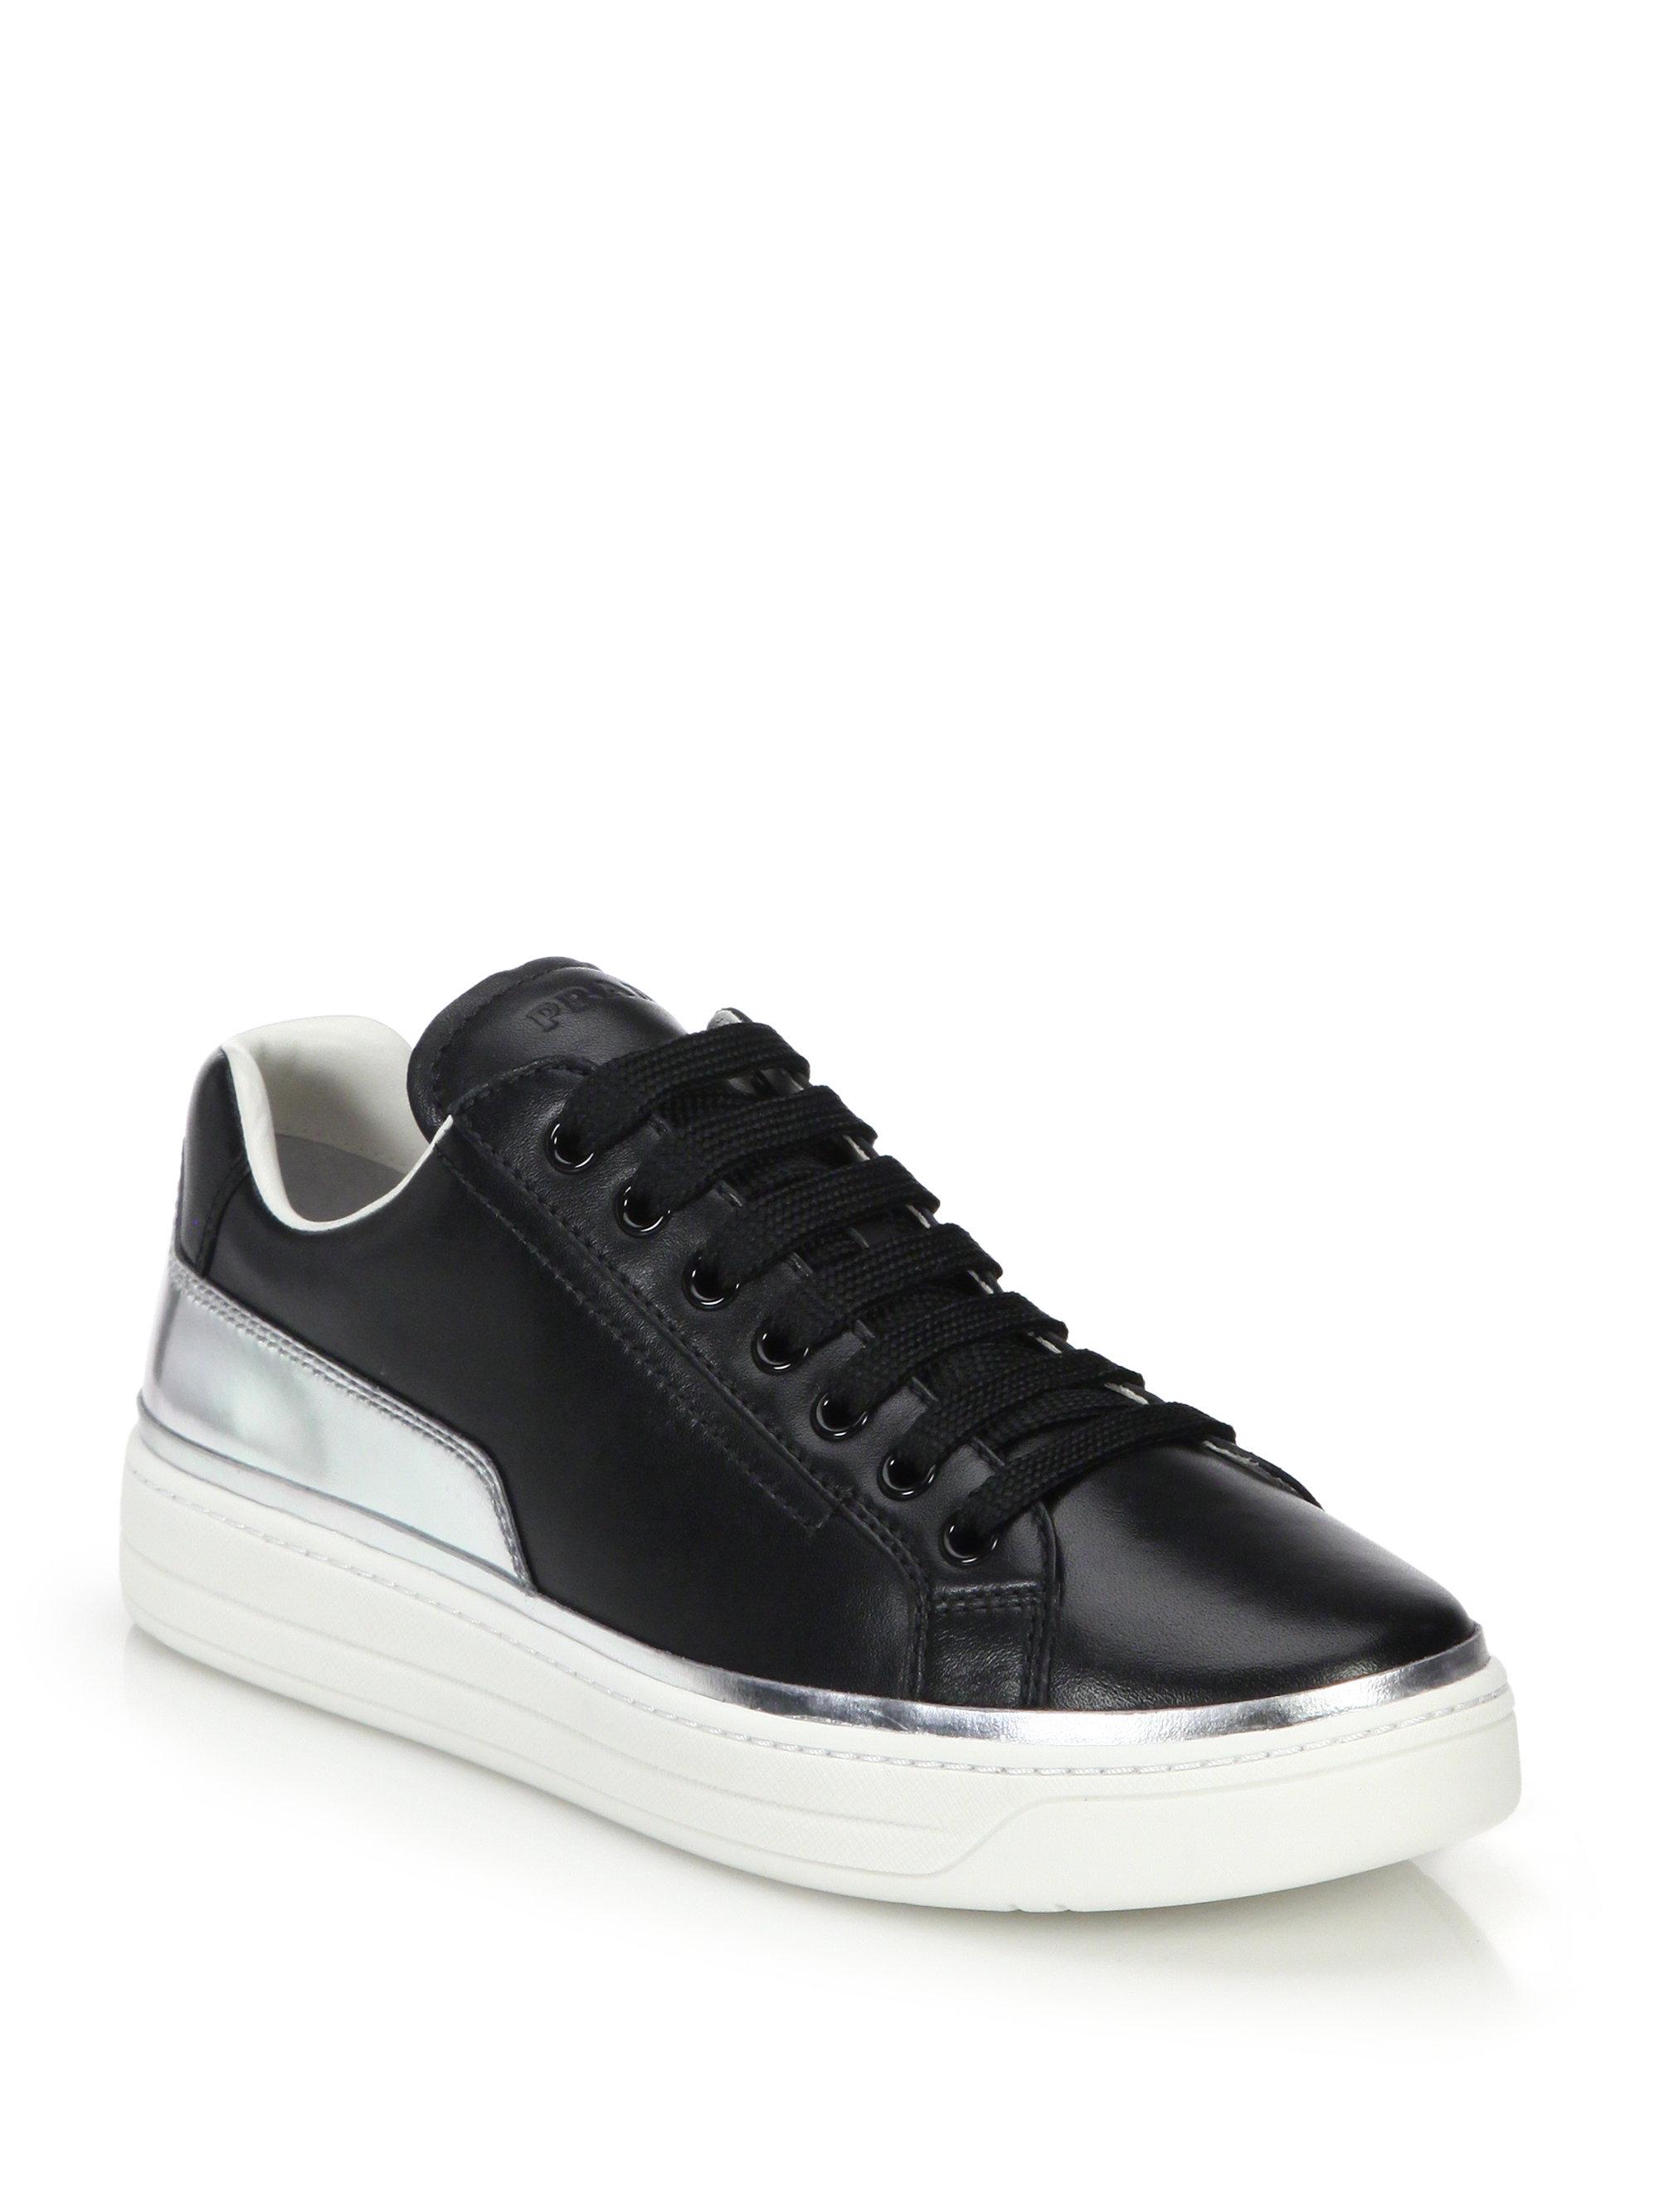 lyst prada metallic leathertrimmed leather sneakers in